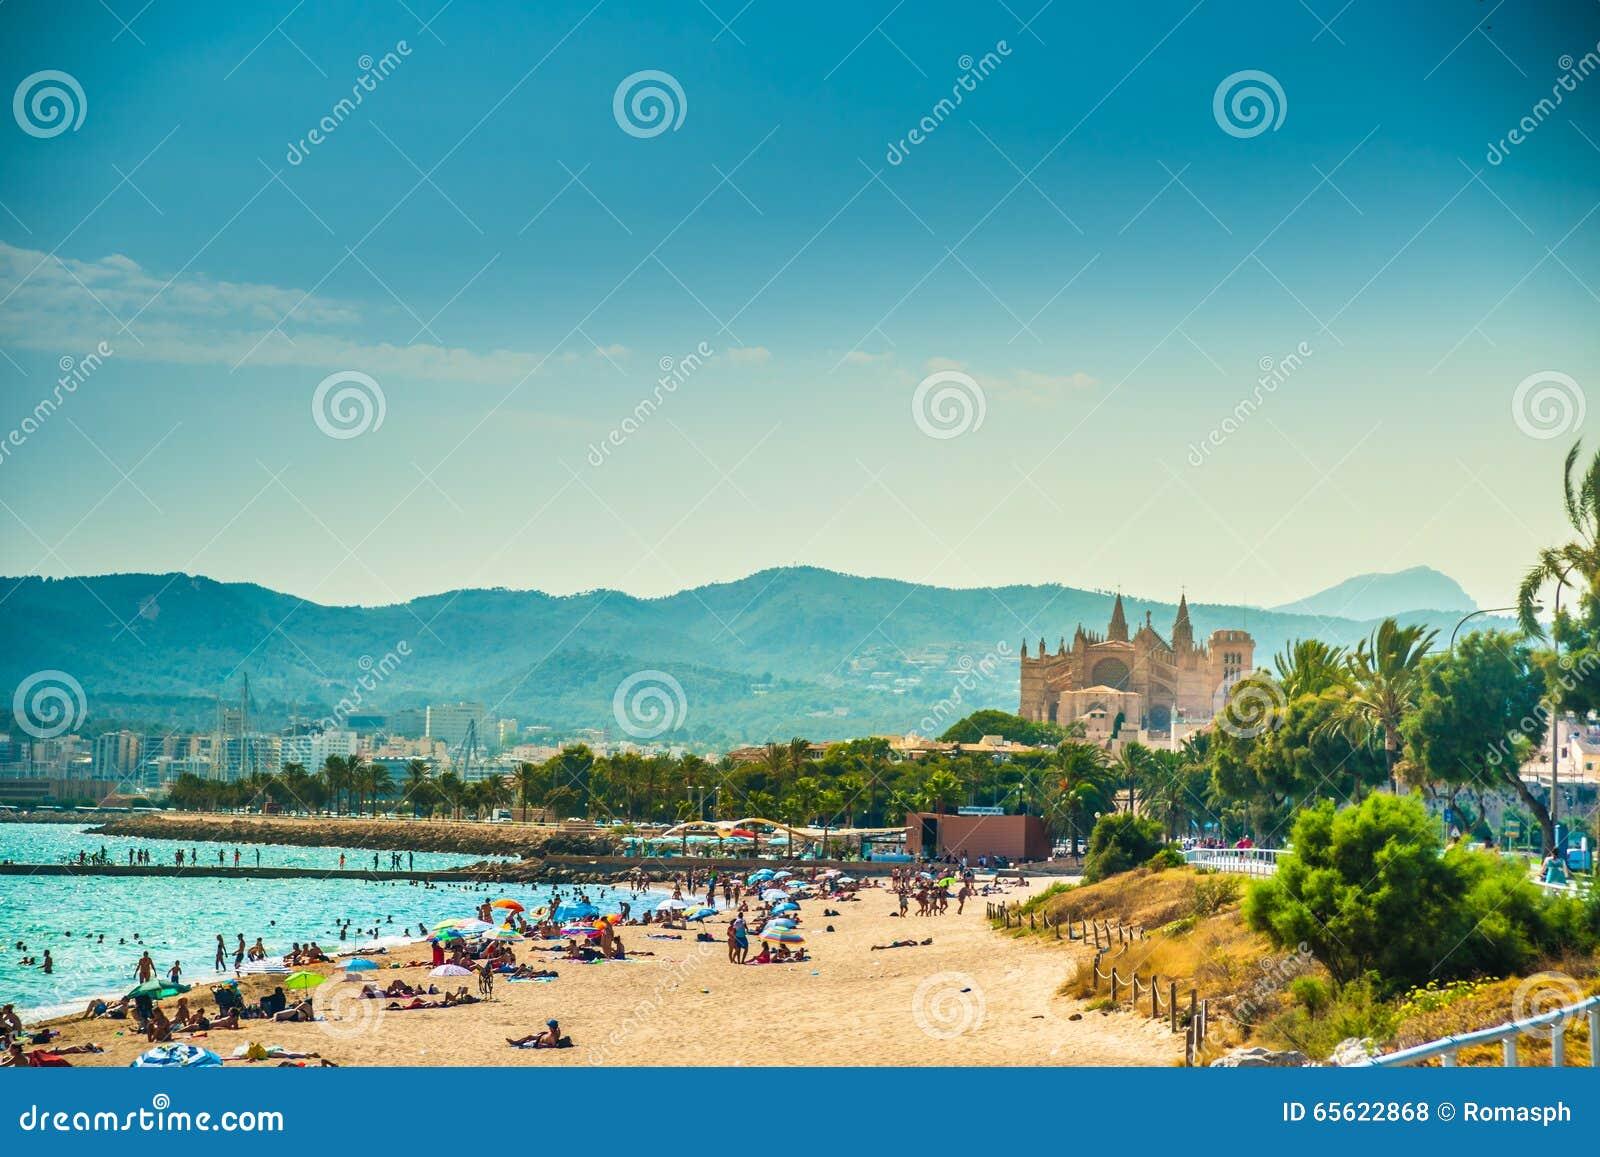 Ansicht des Strandes von Palma de Mallorca